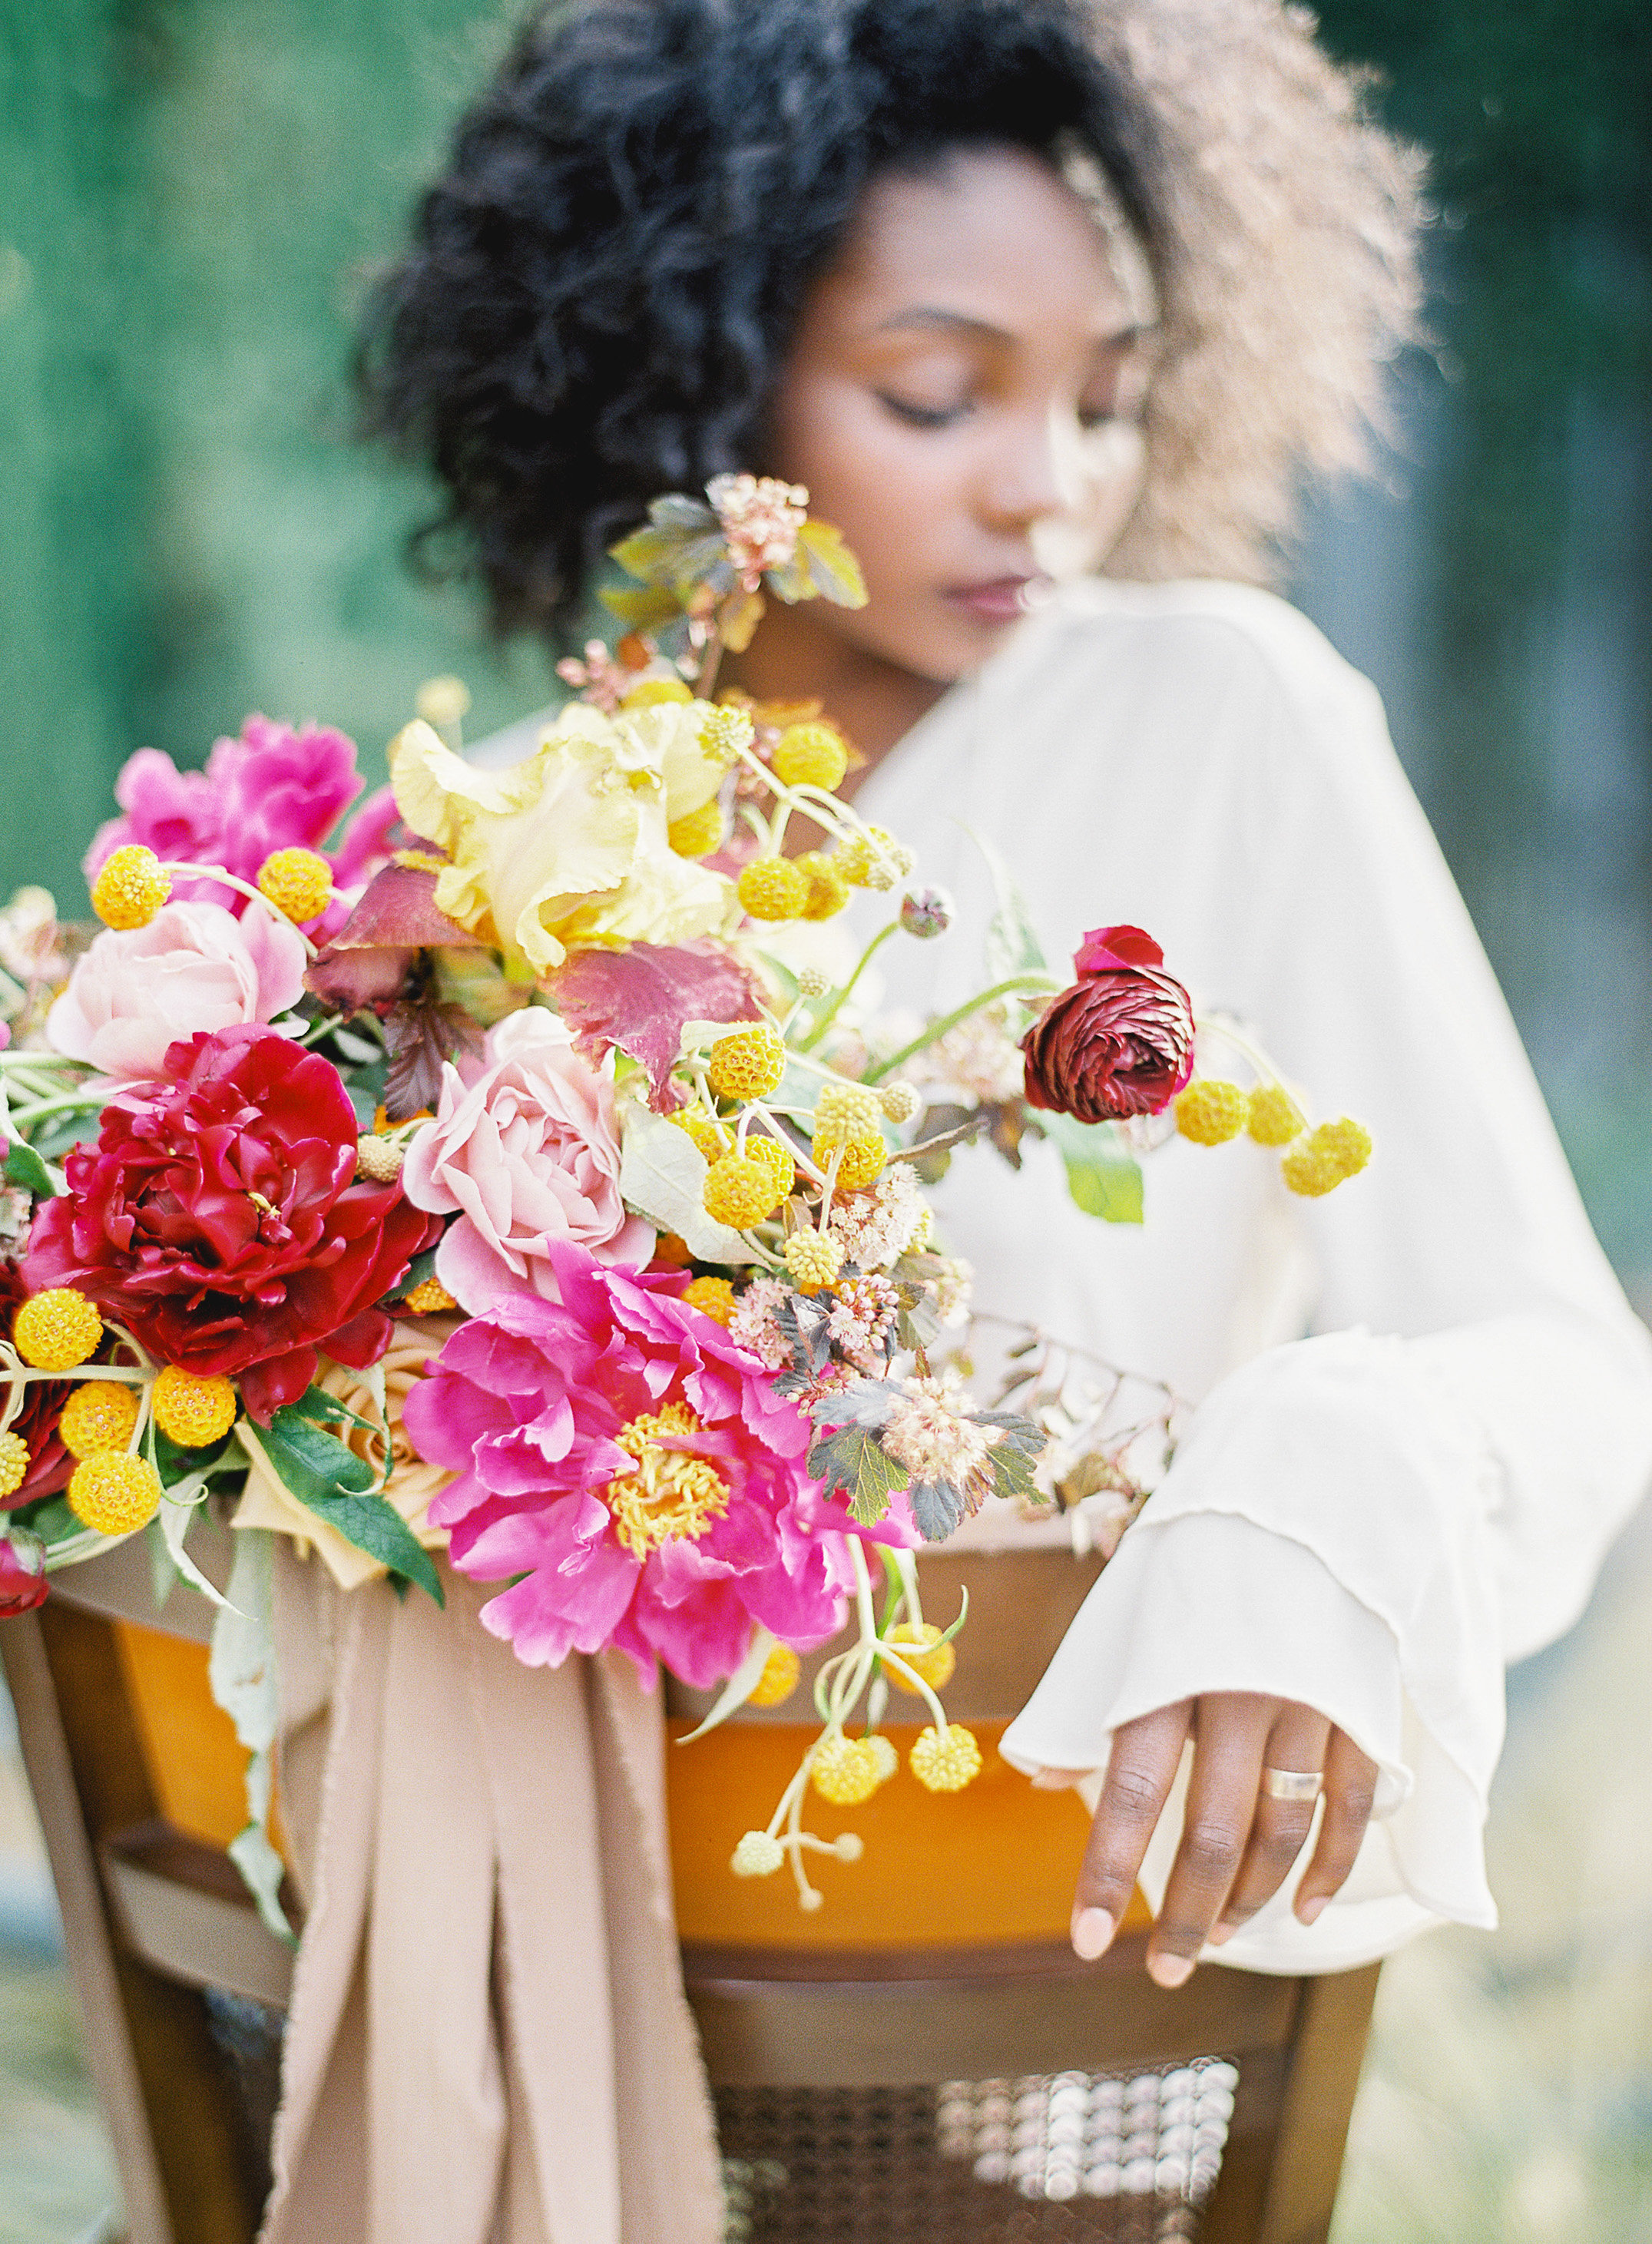 Tono and Co Lavenders Flowers-ORANGE shoot-0017.jpg